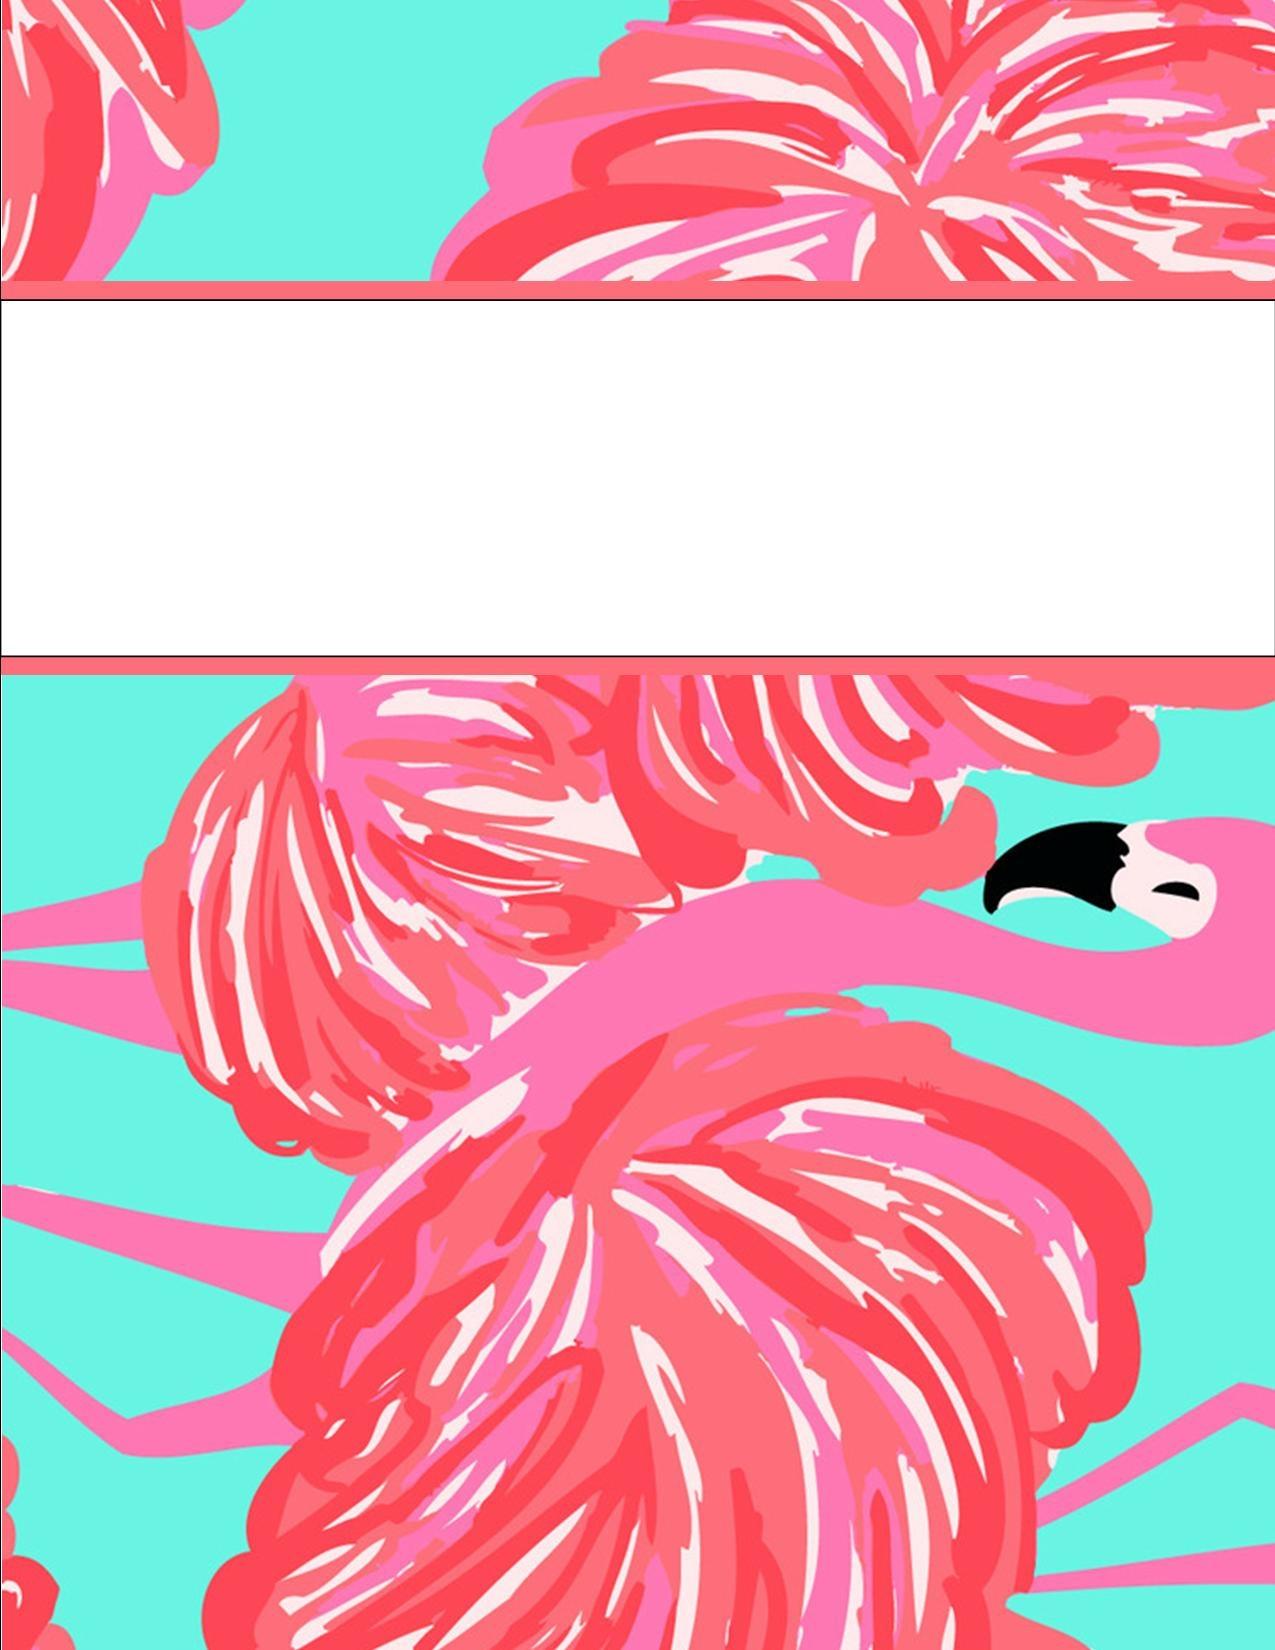 My Cute Binder Covers | Happily Hope - Free Printable Binder Covers